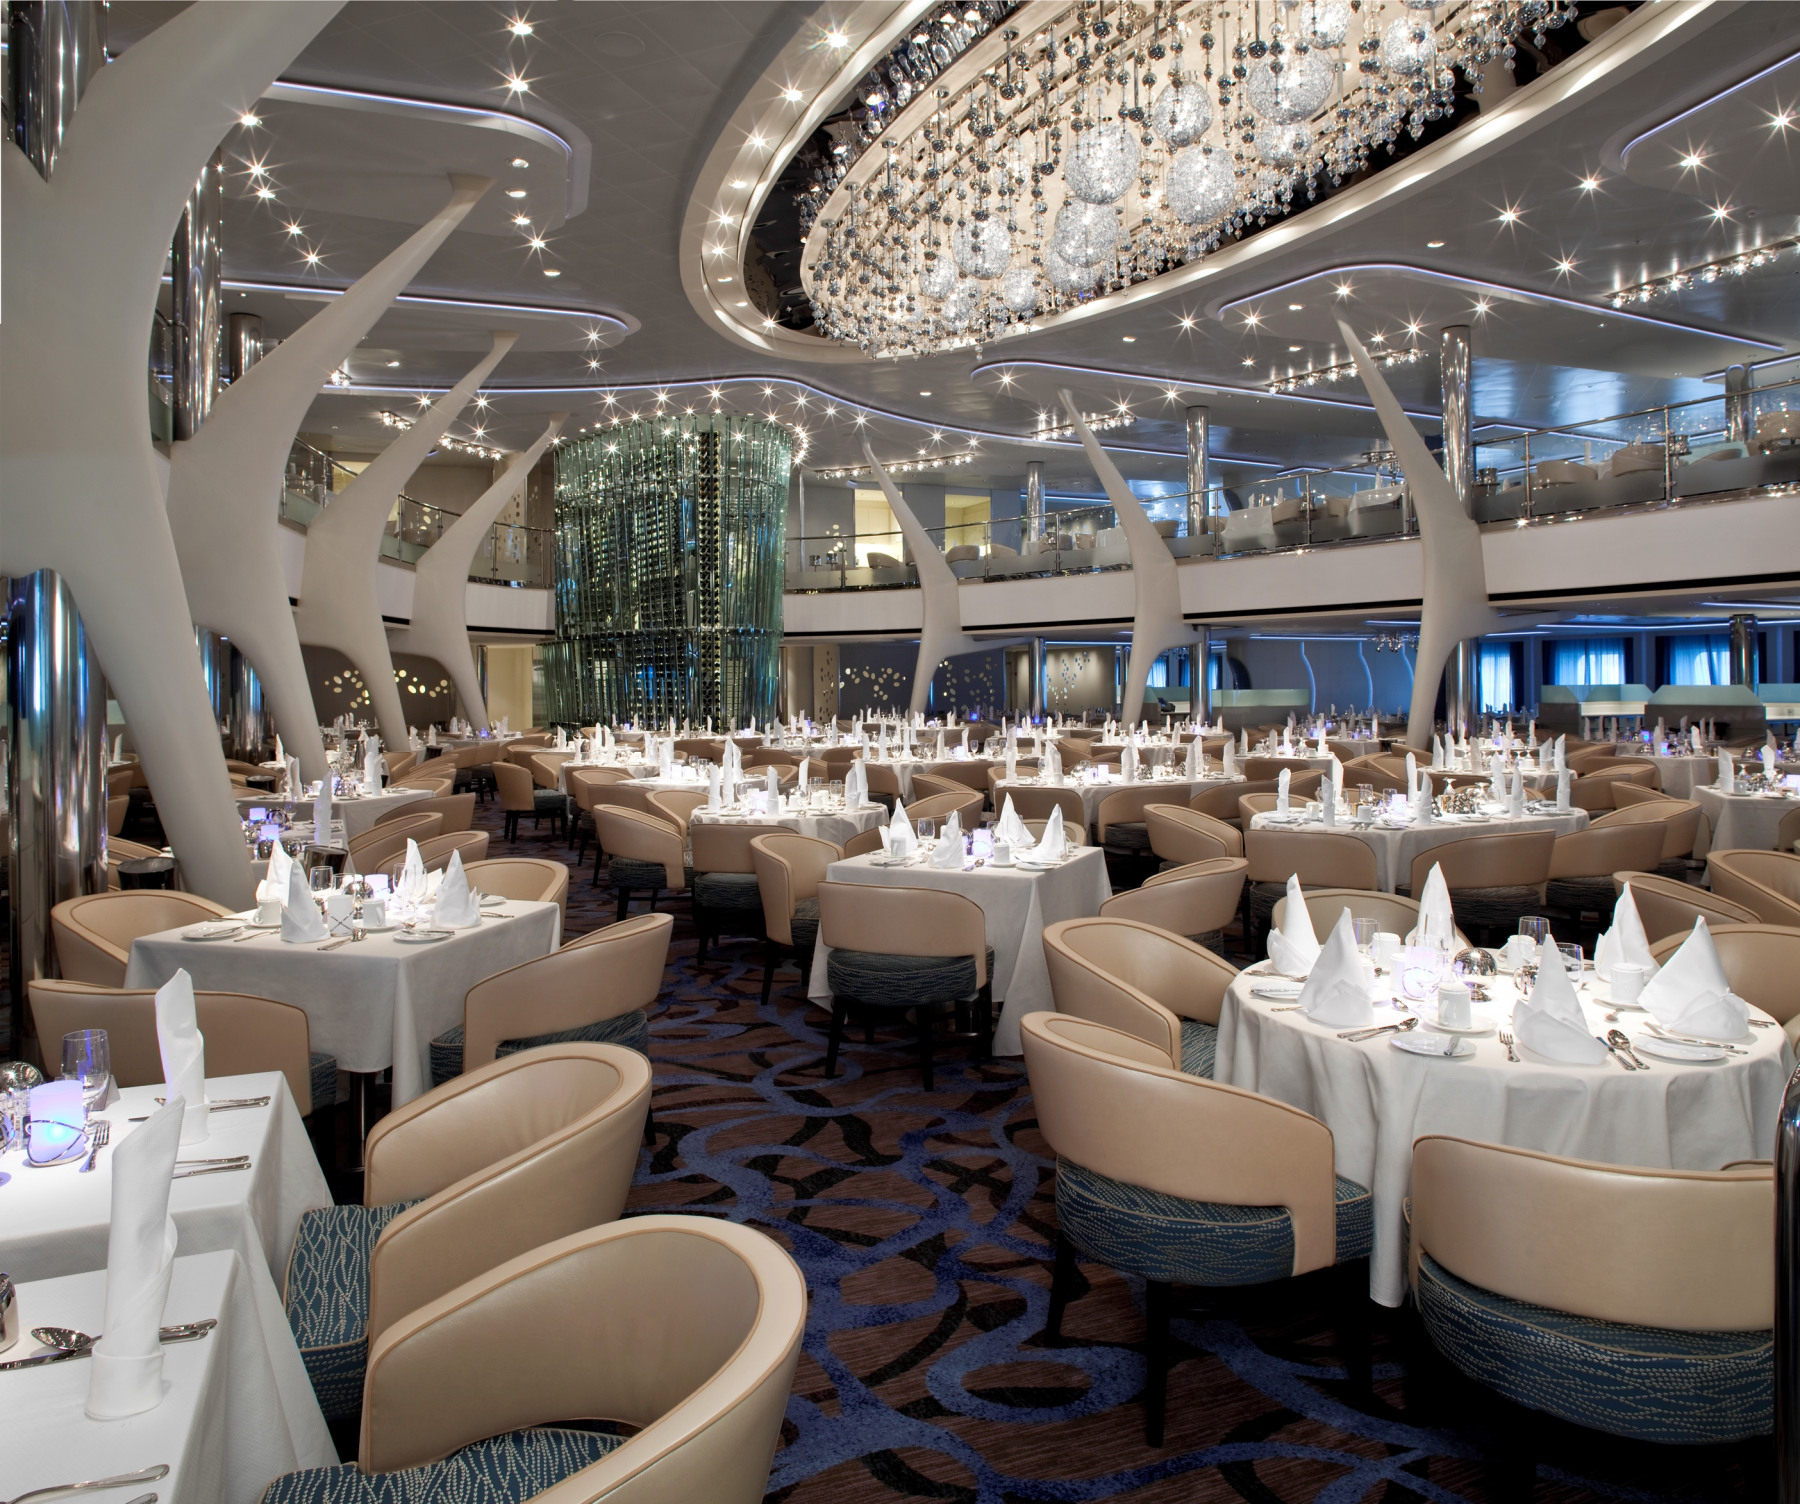 celebrity cruises celebrity eclipse moonlight sonata restaurant.jpg